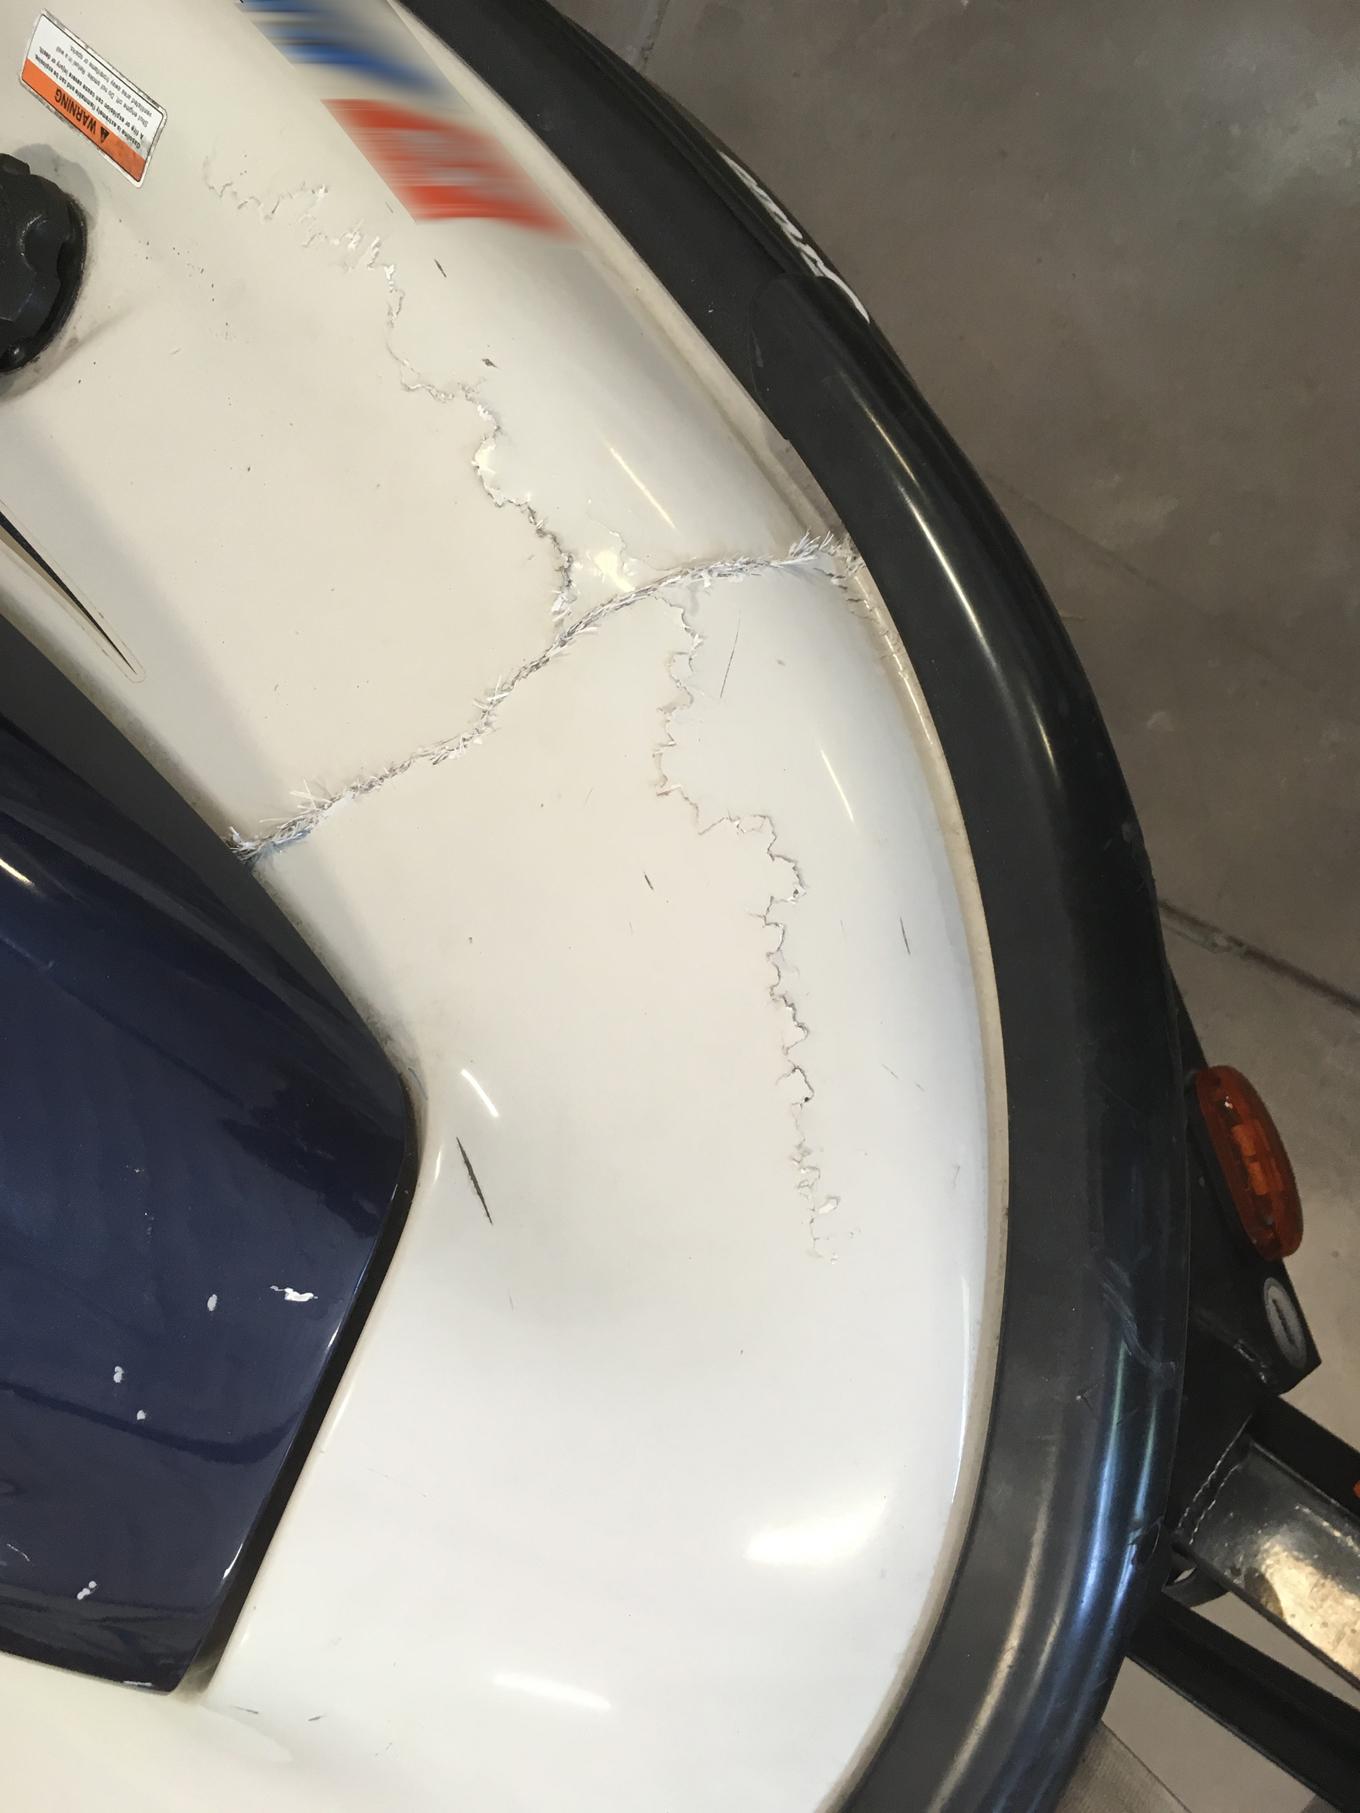 Damaged jet ski with cracks.